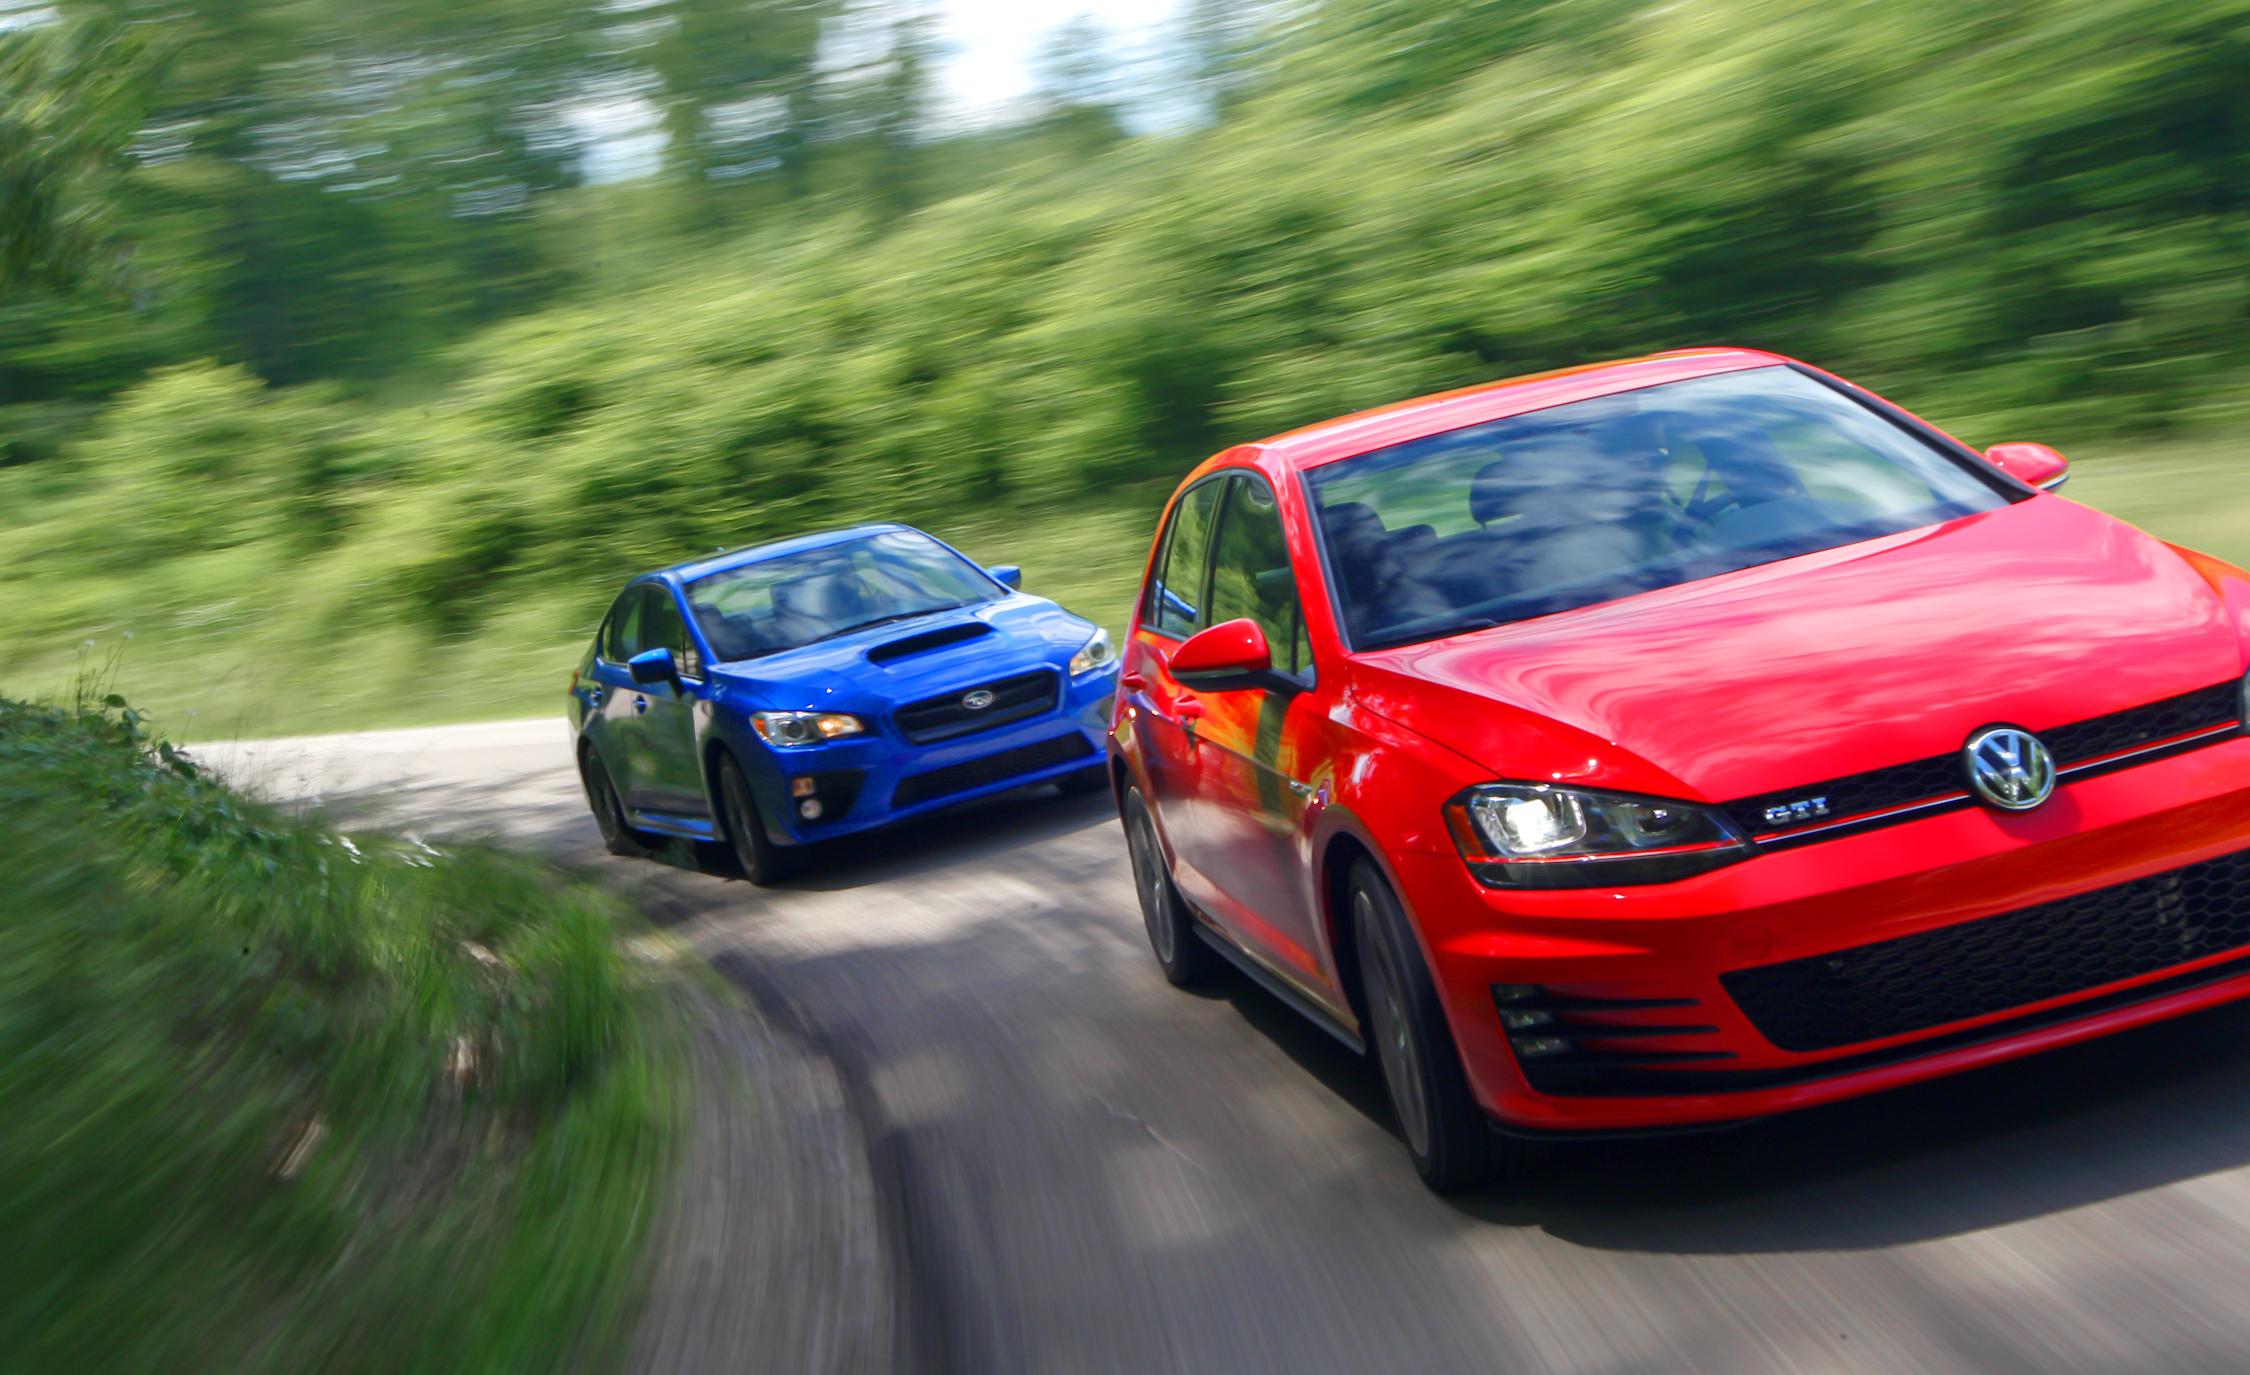 Volkswagen GTI 2015 vs Subaru WRX 2015 Comparison